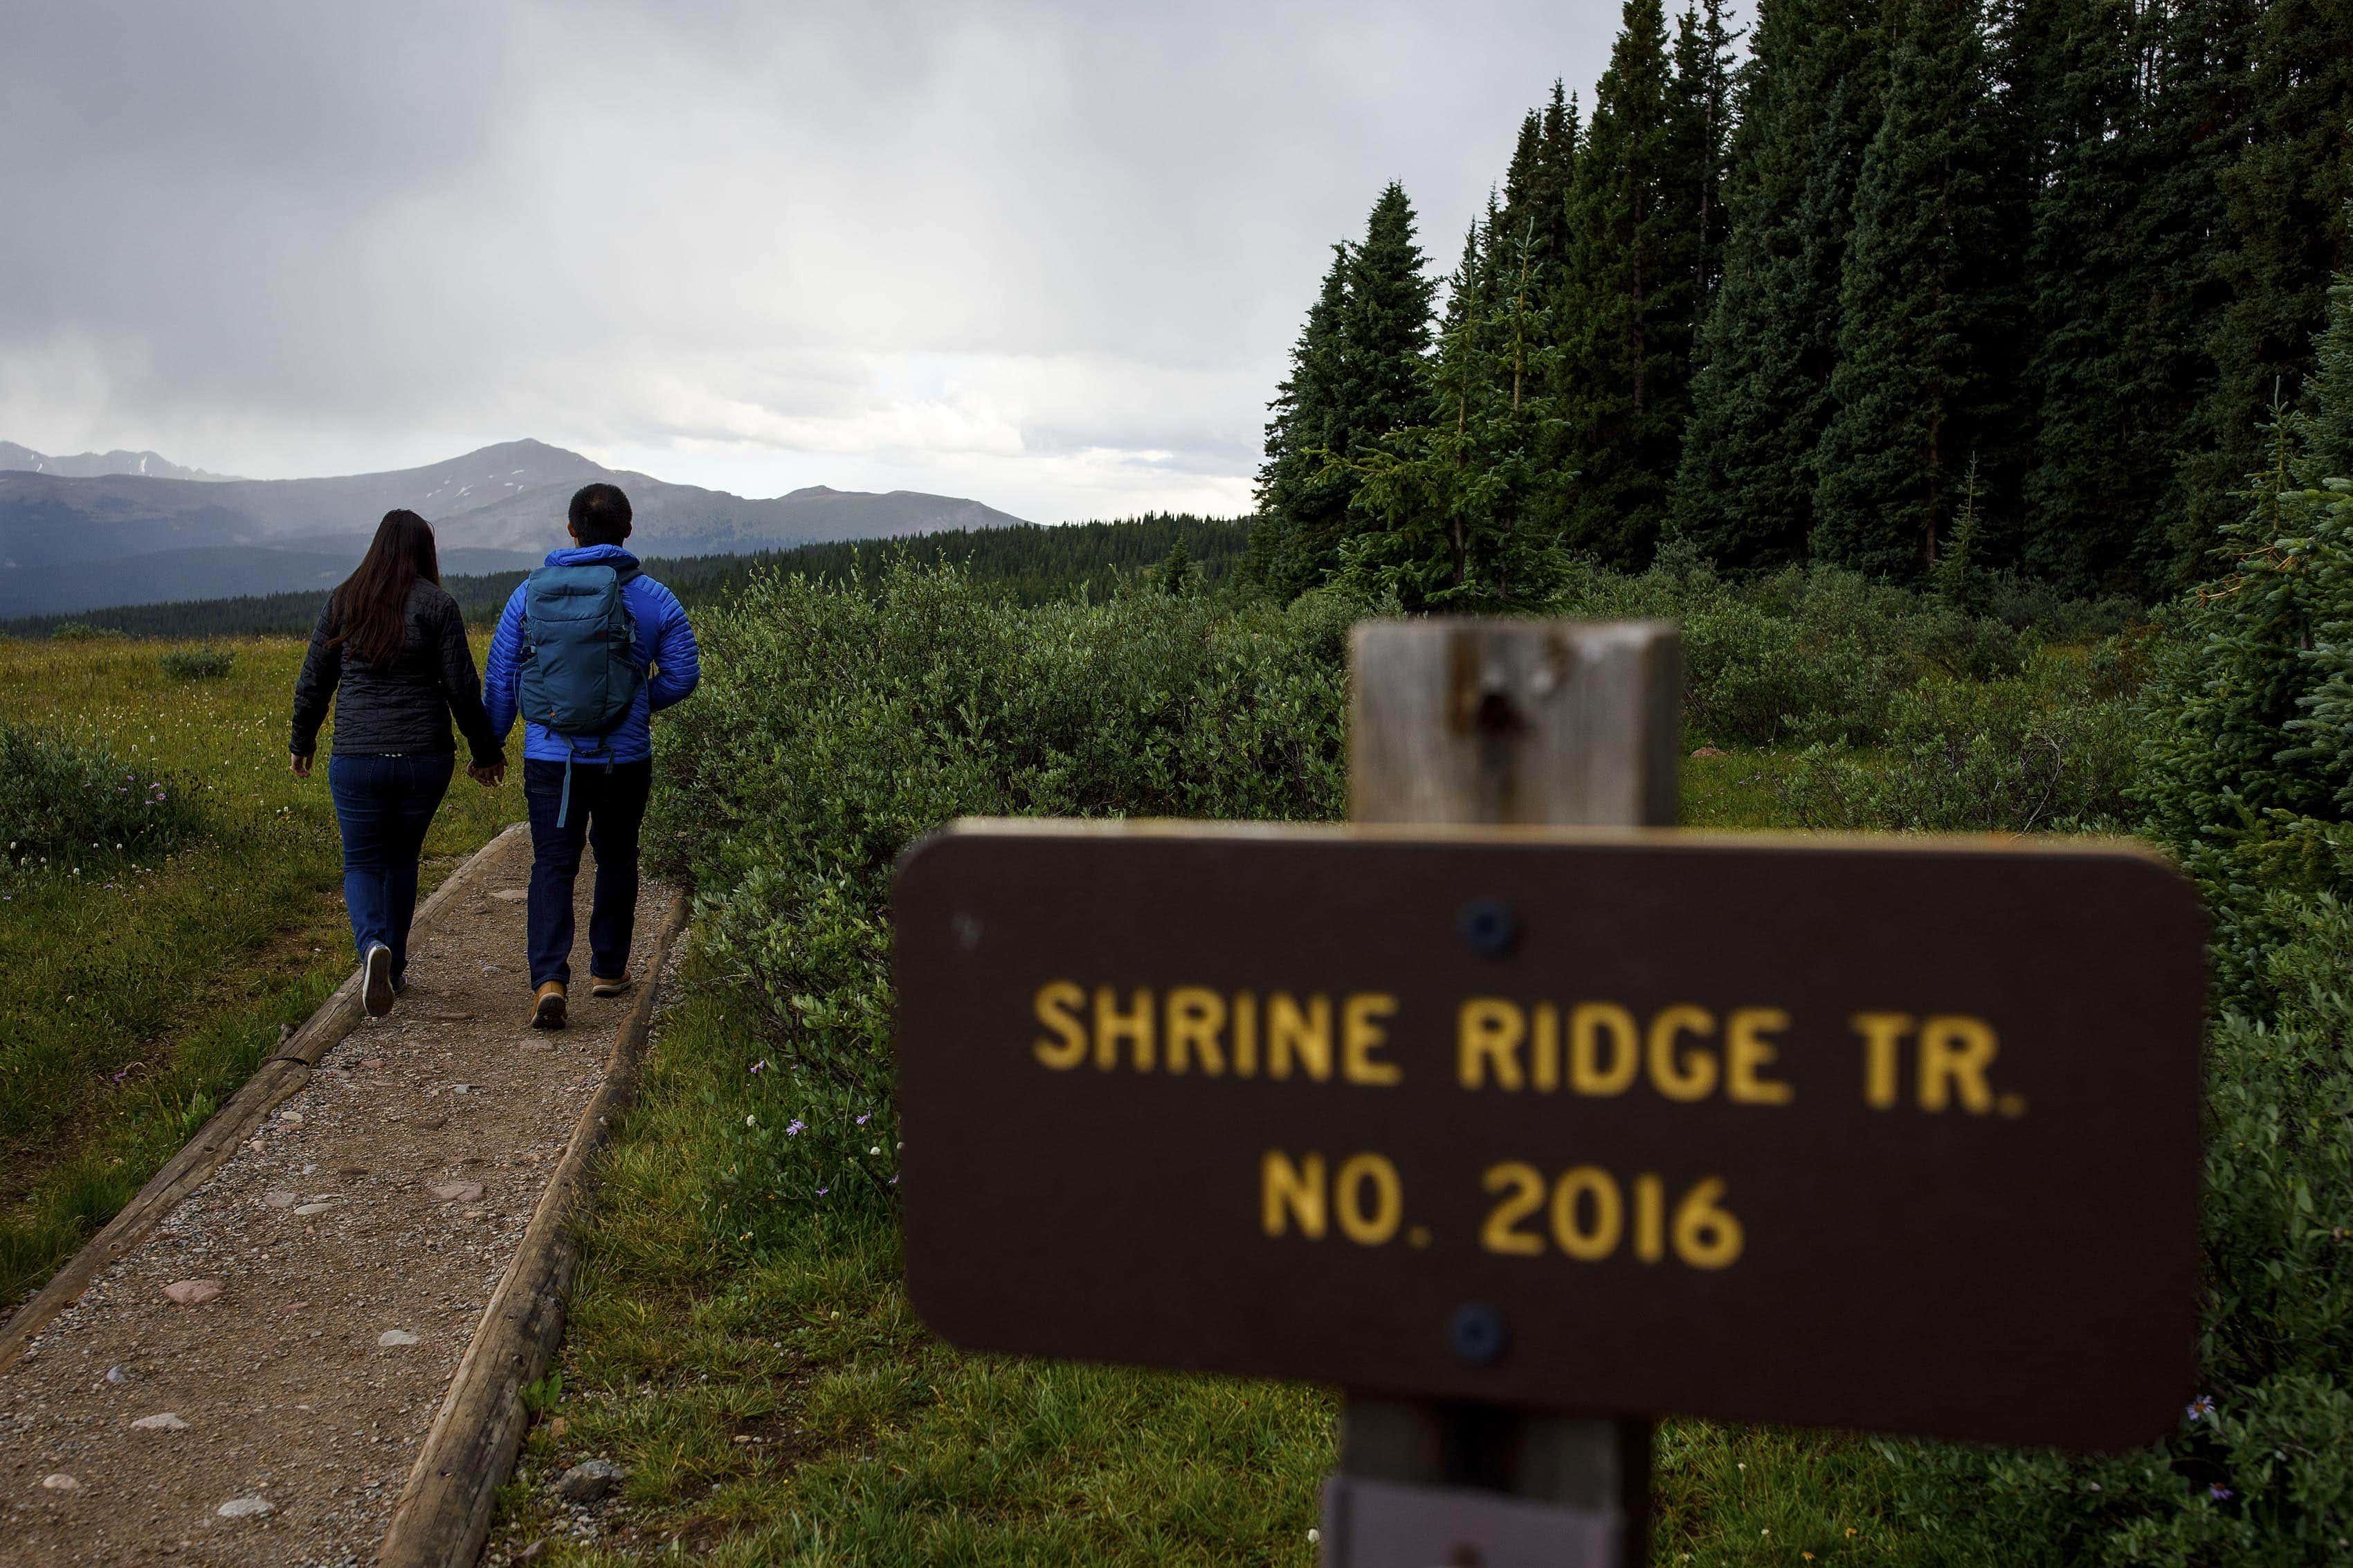 A couple walks along the Shrine Ridge Trail